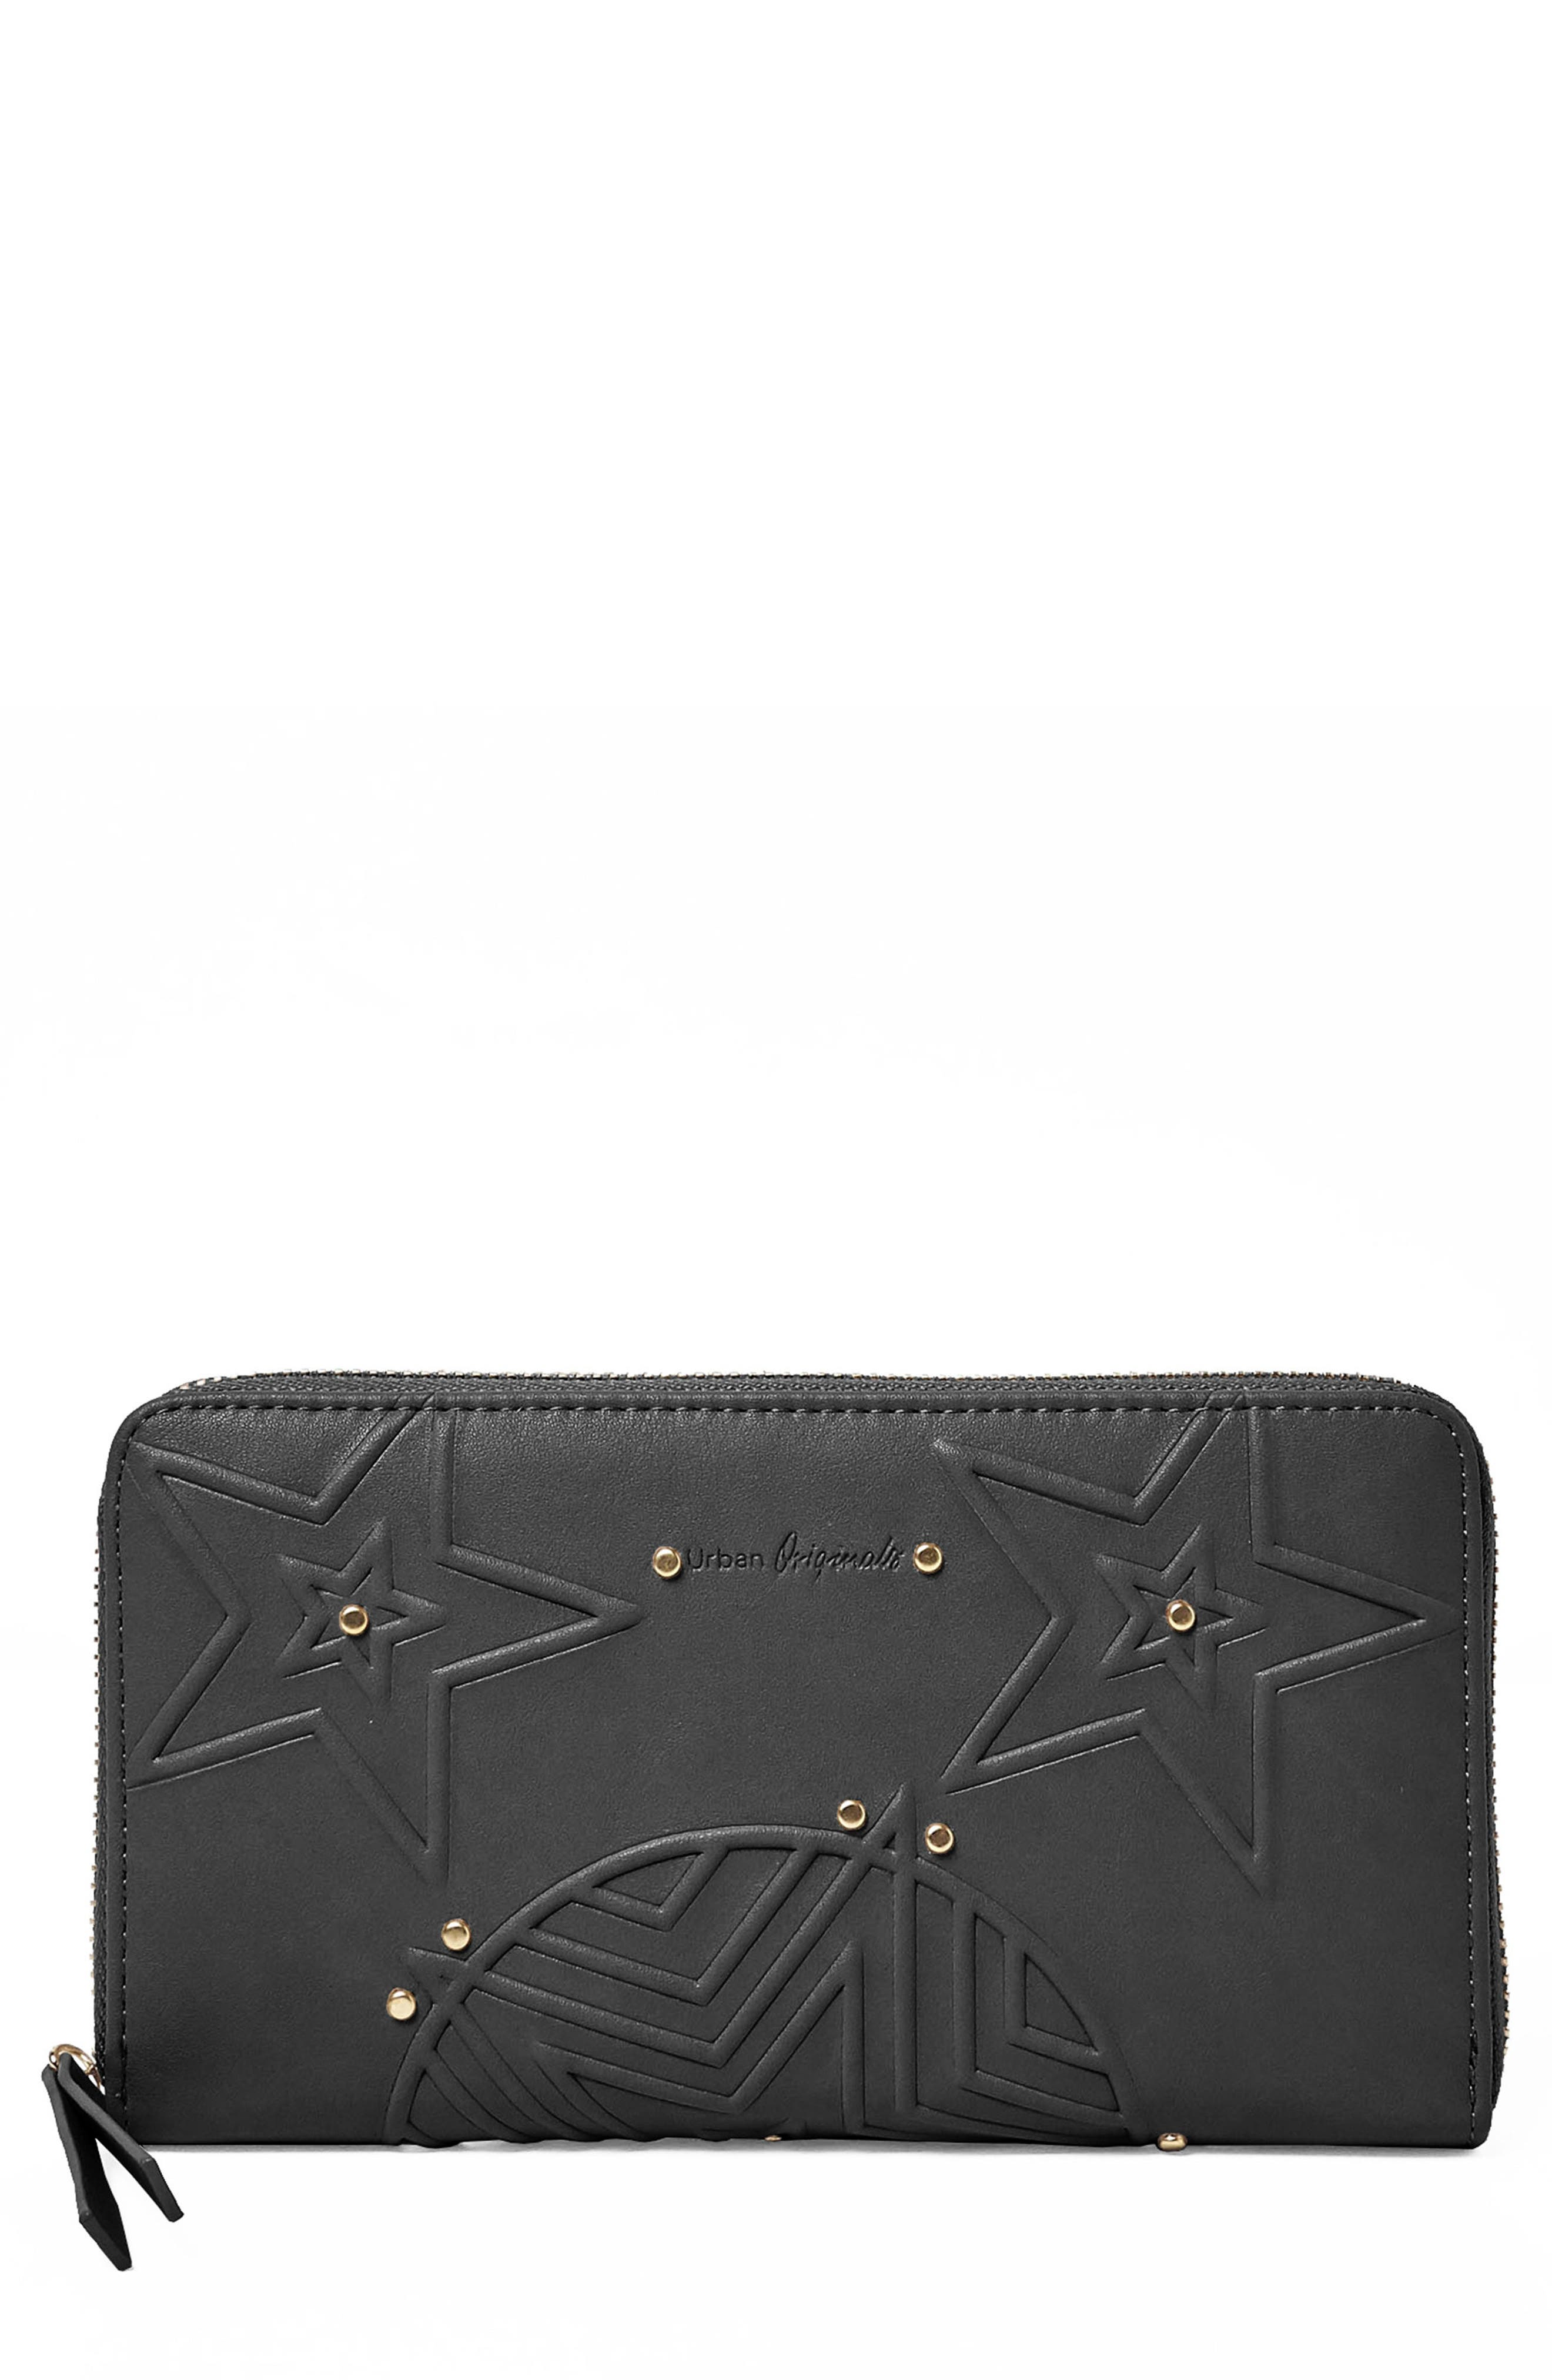 Cosmic Vegan Leather Wallet,                         Main,                         color, Black